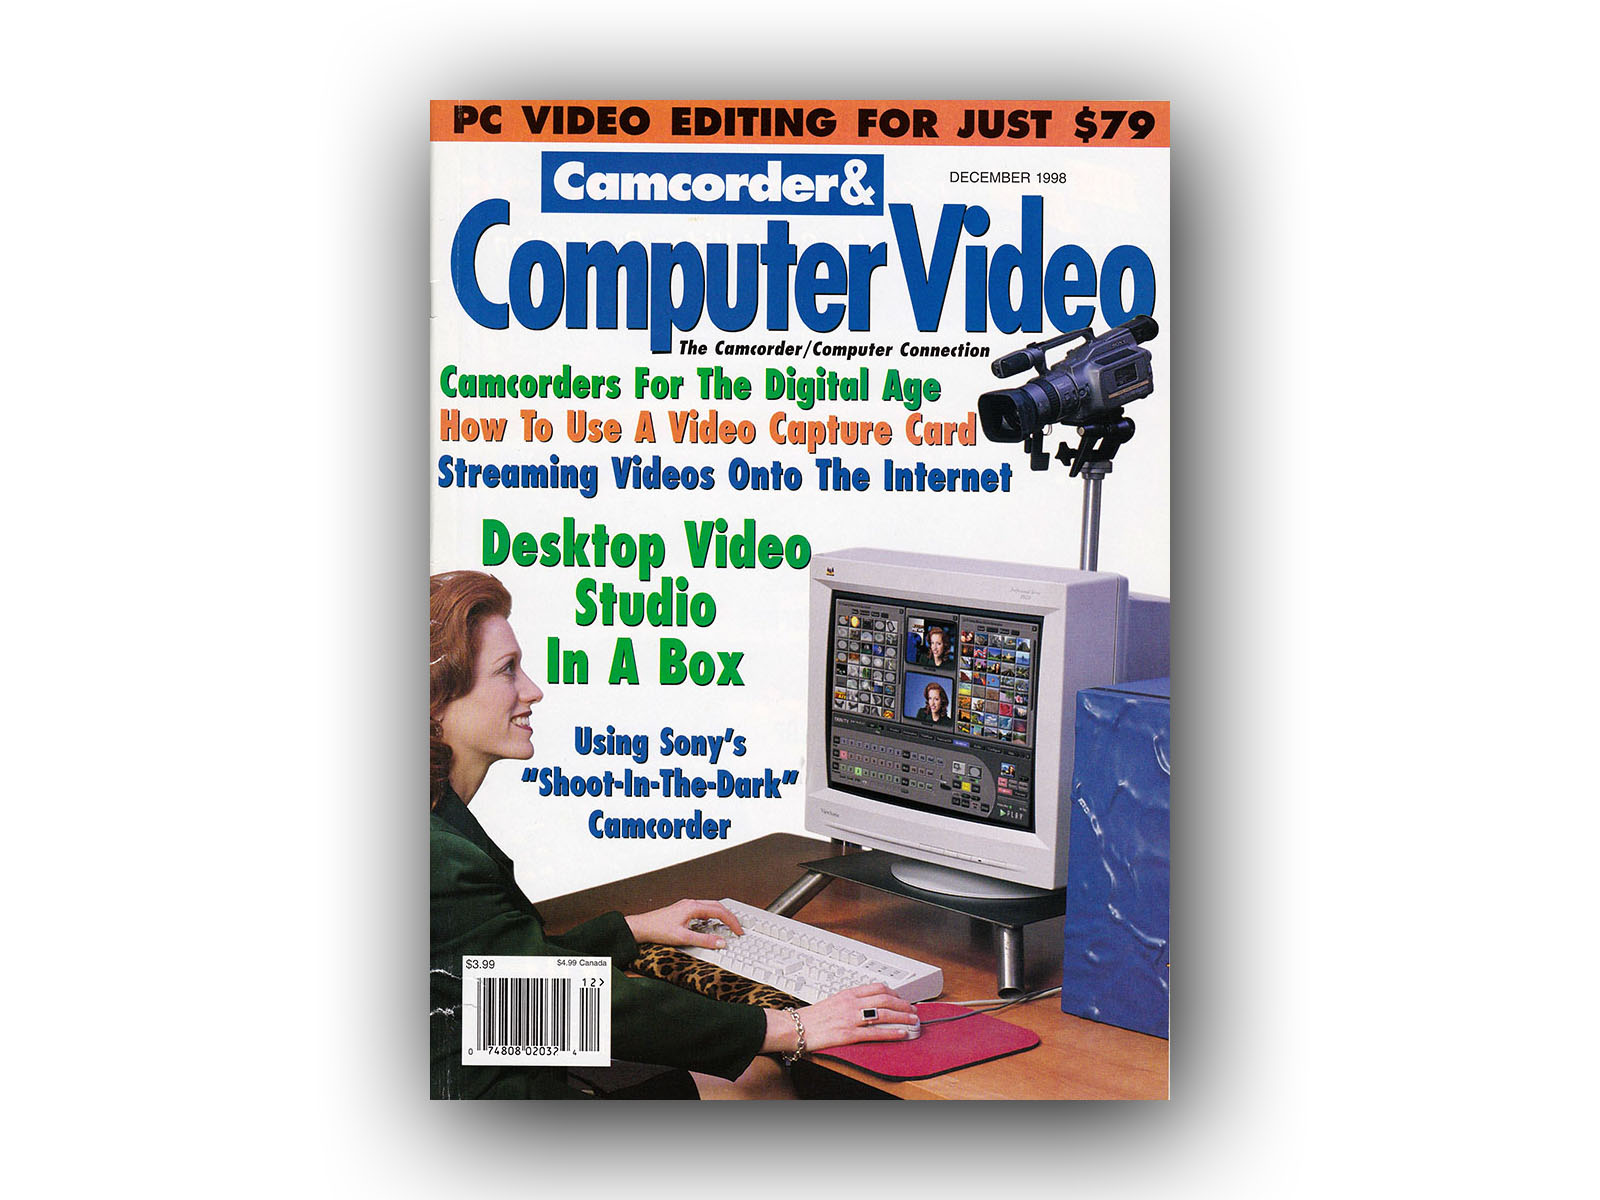 _0018_MagazineCamcorderCompuerVideo-Dec98-Cover_web.jpg